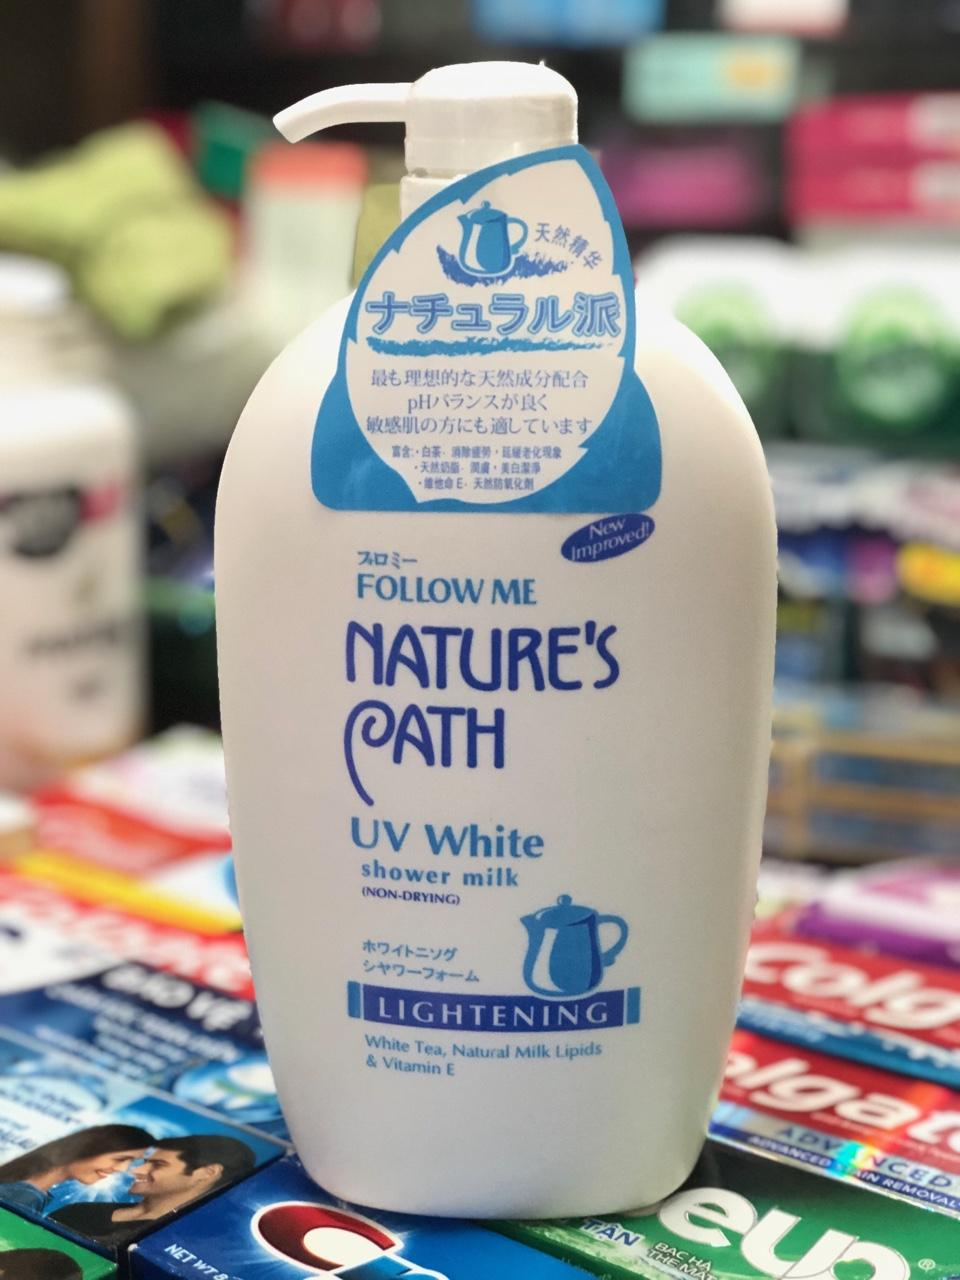 SỮA TẮM TRẮNG DA FOLLOW ME NATURE PATH UV WHITE SHOWER MILK 1000ml